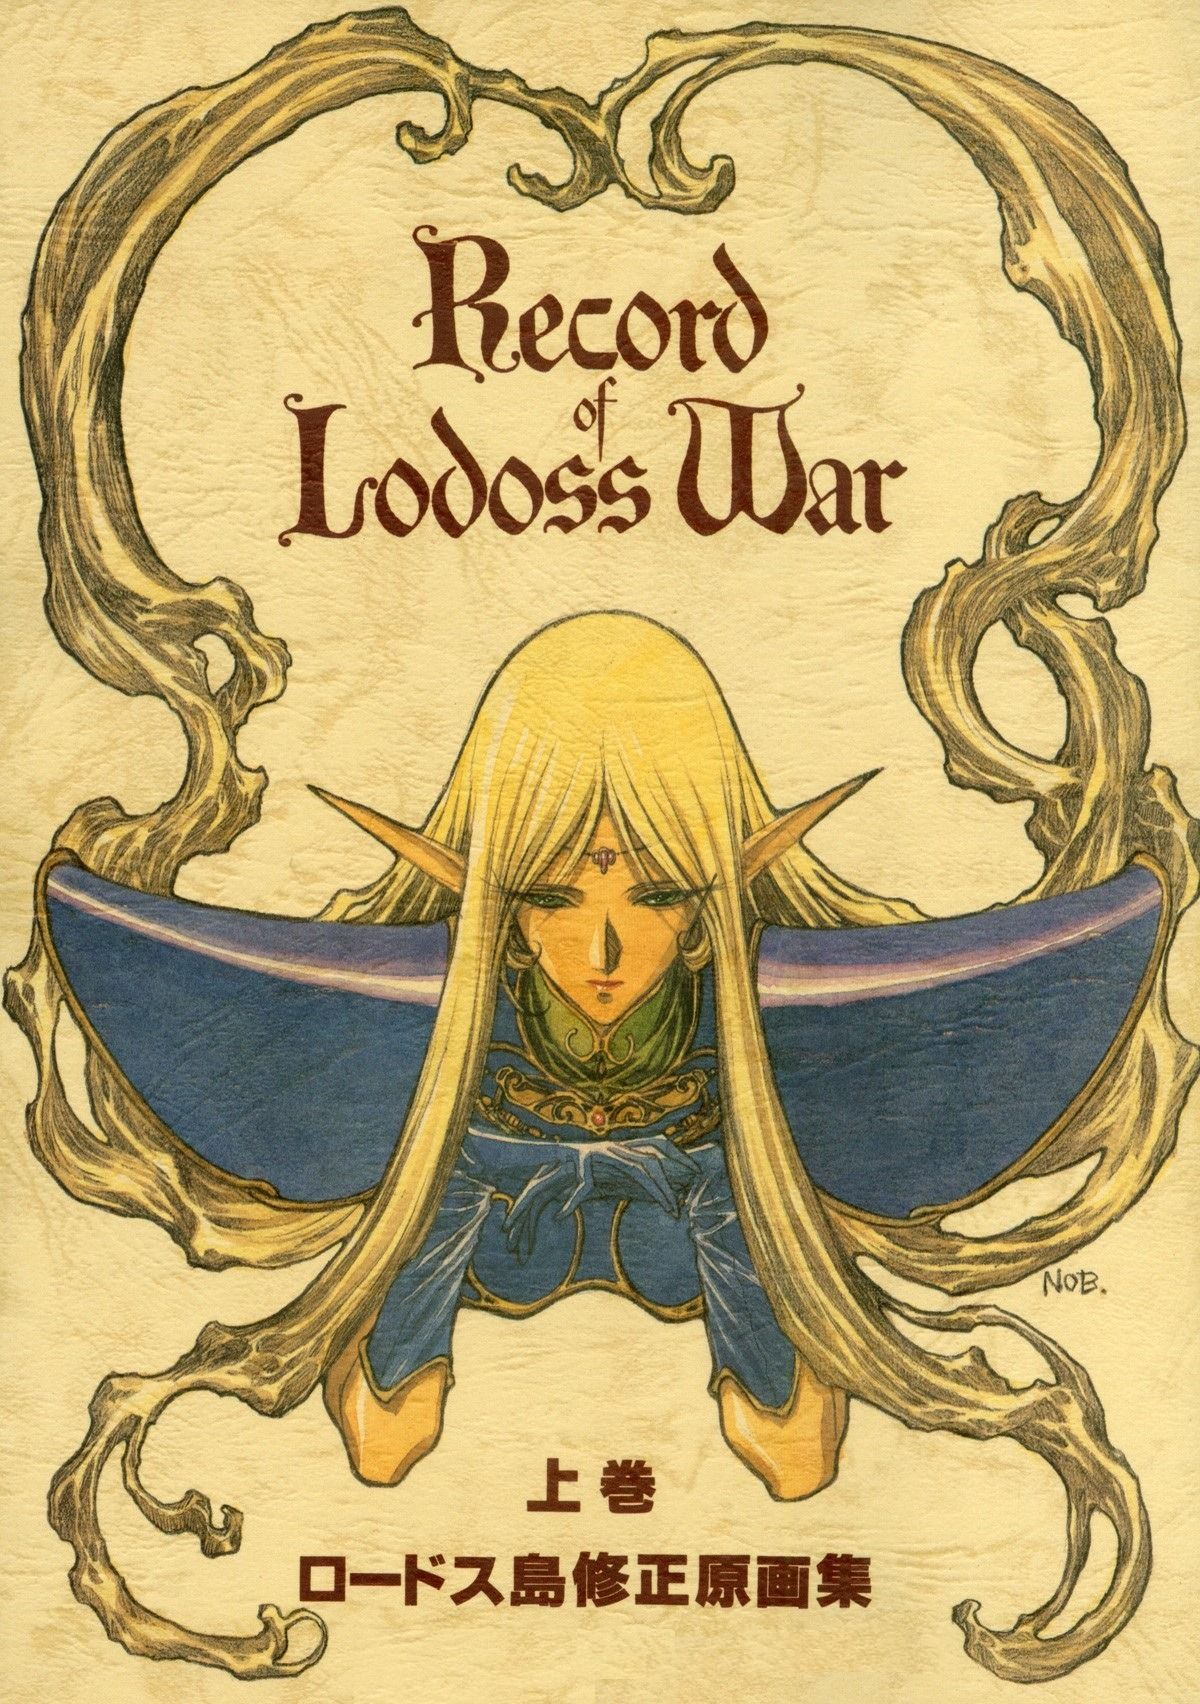 Joy in 2dimensions joyin2d record of lodoss war old